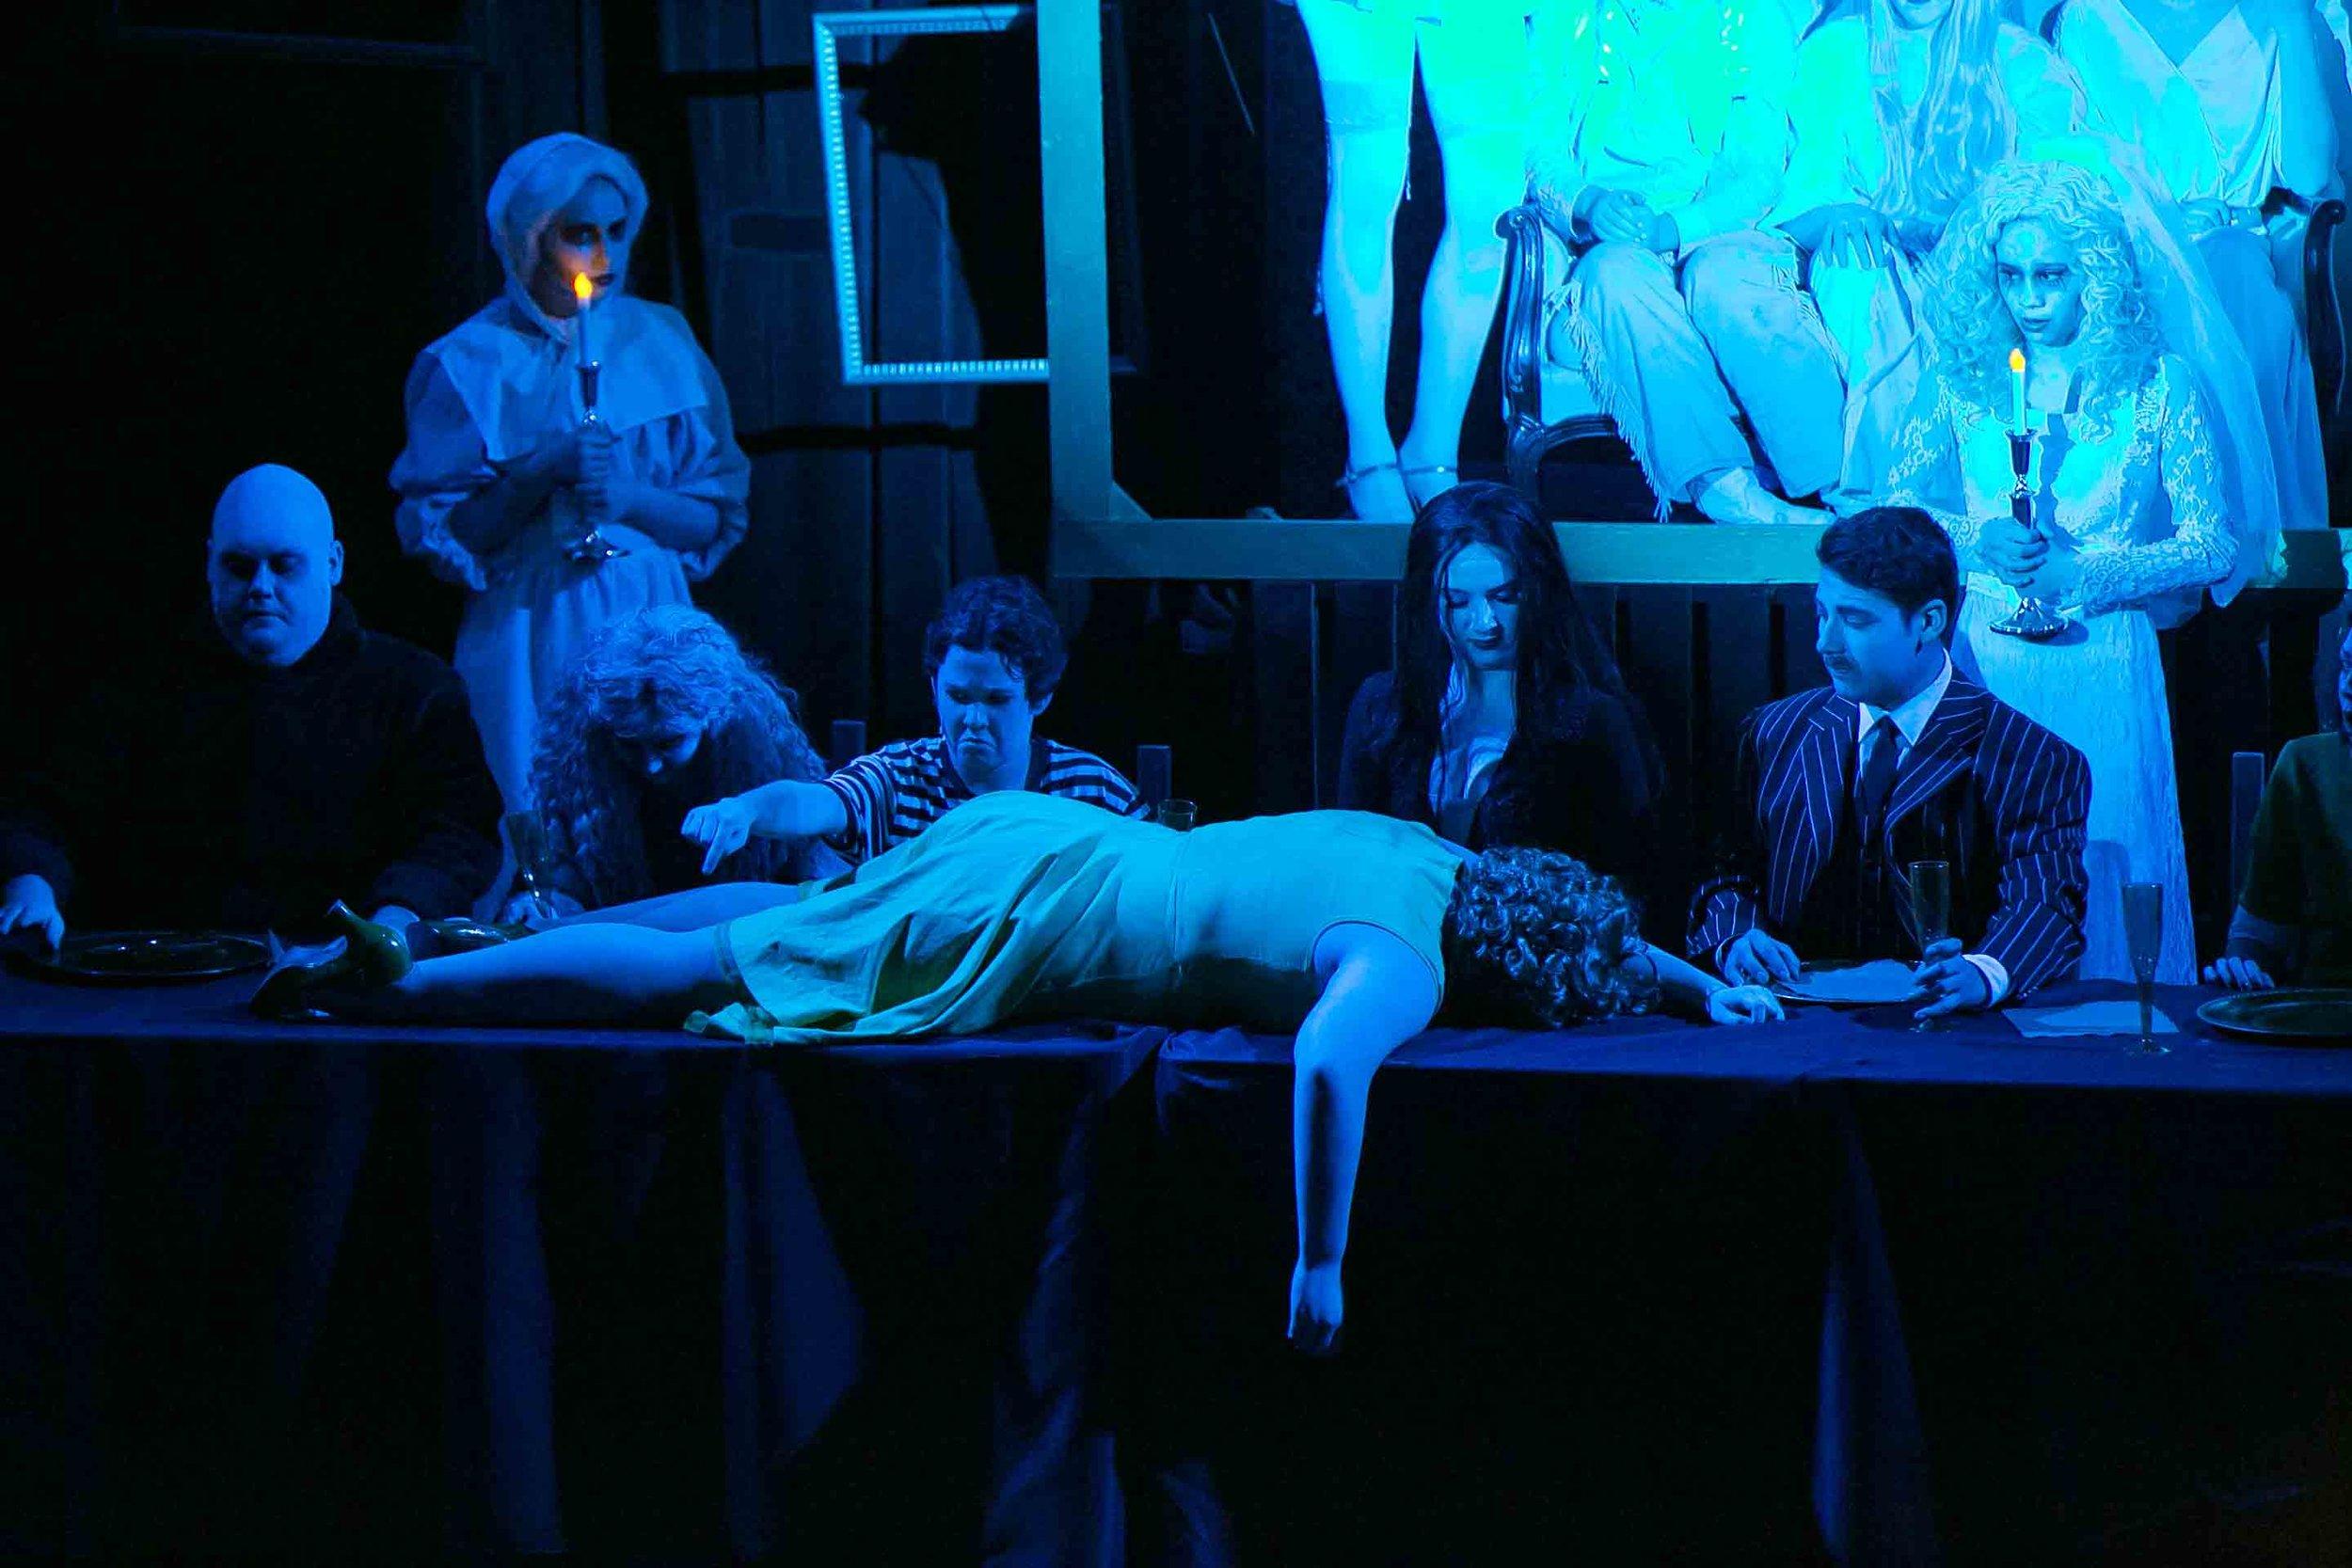 6-19-16 Addams Family Creepy Cast 0203.jpg